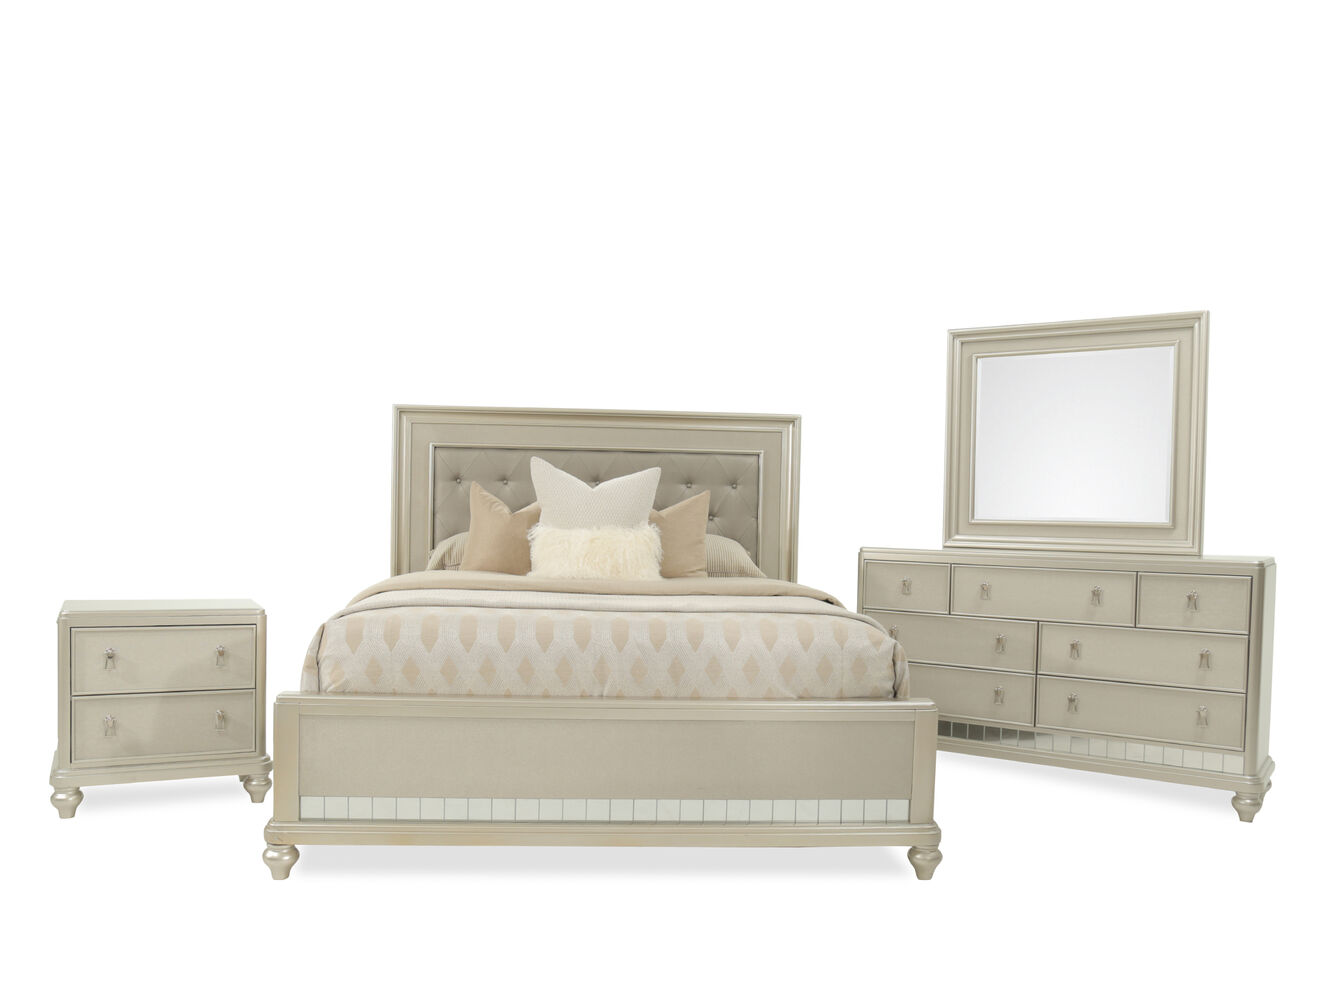 Mathis Brothers Bedroom Furniture Samuel Lawrence Diva Bed Suite Mathis Brothers Furniture